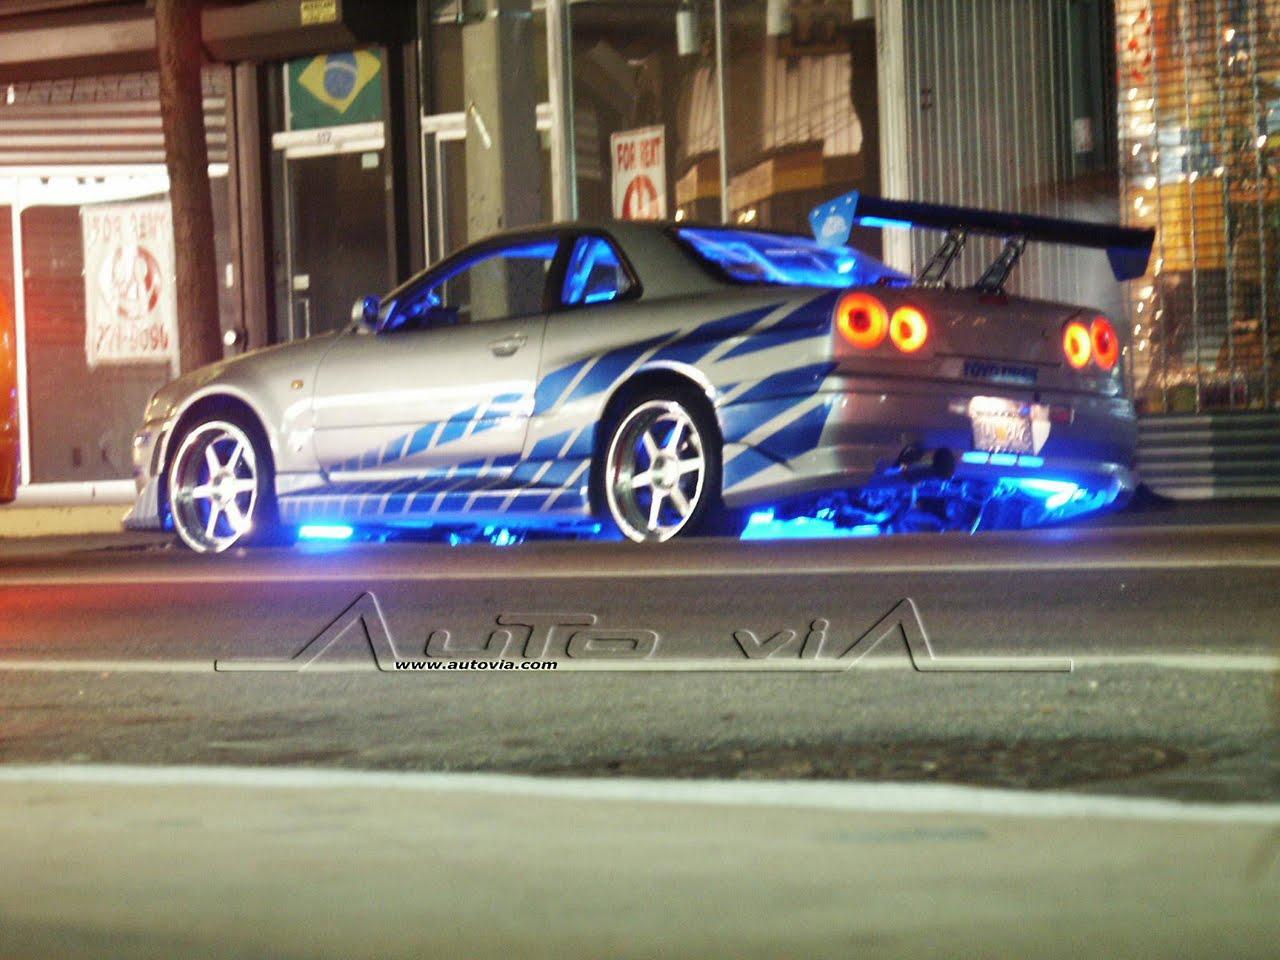 http://4.bp.blogspot.com/-cj55R56SEDY/TVzvq-NGGuI/AAAAAAAABeA/N6lNbC1alLk/s1600/Nissan_Skyline_gtr_10.sized.jpg